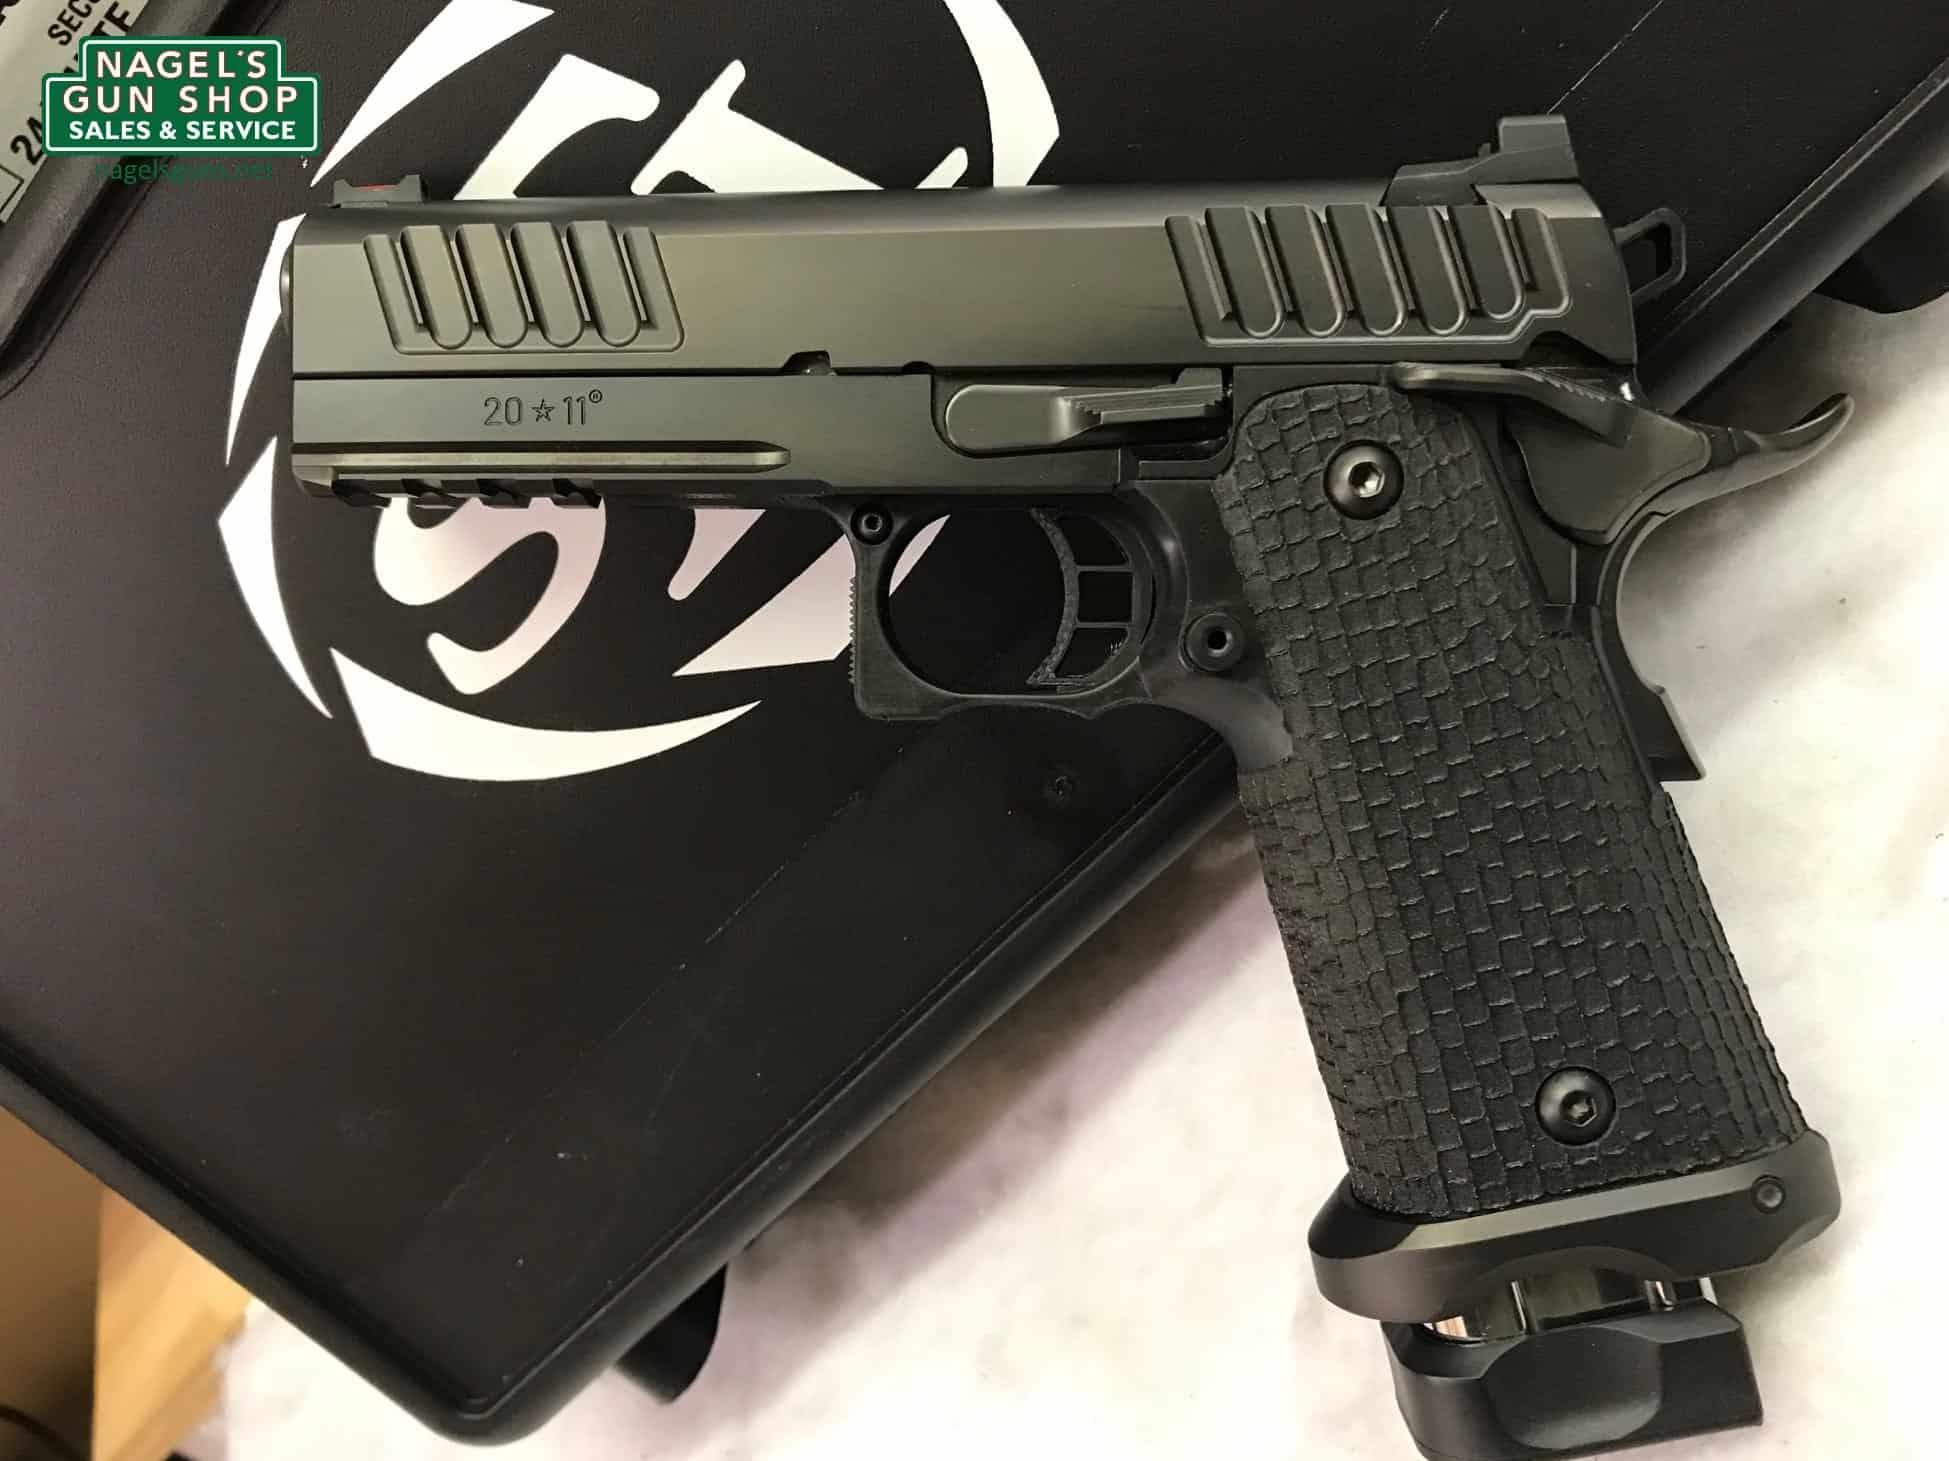 Sti 2011 Staccato P Pistol 9mm Black Dlc Fiber Optic